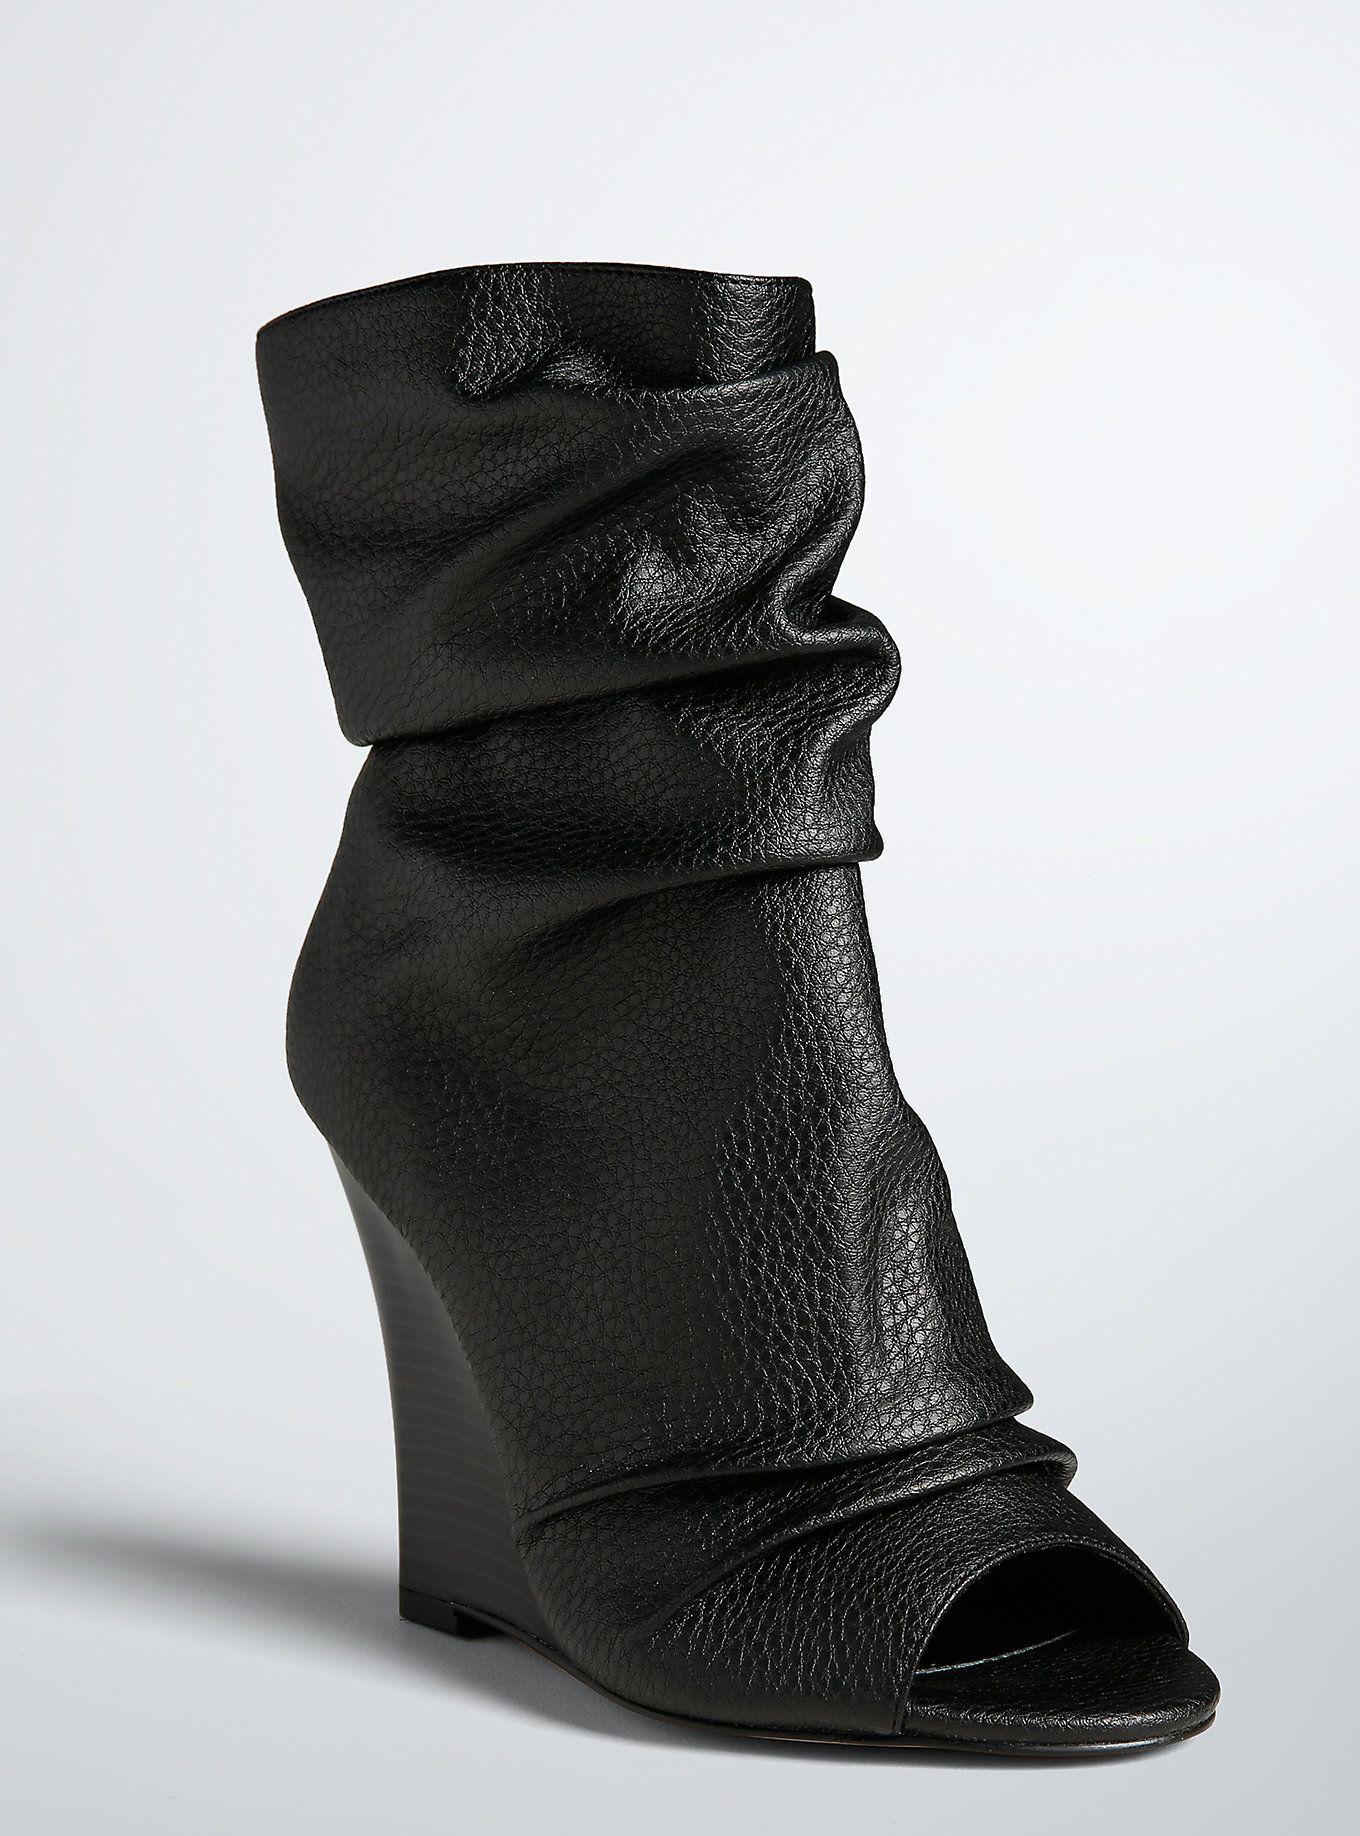 Fashion week How to peep wear toe wedge booties for girls